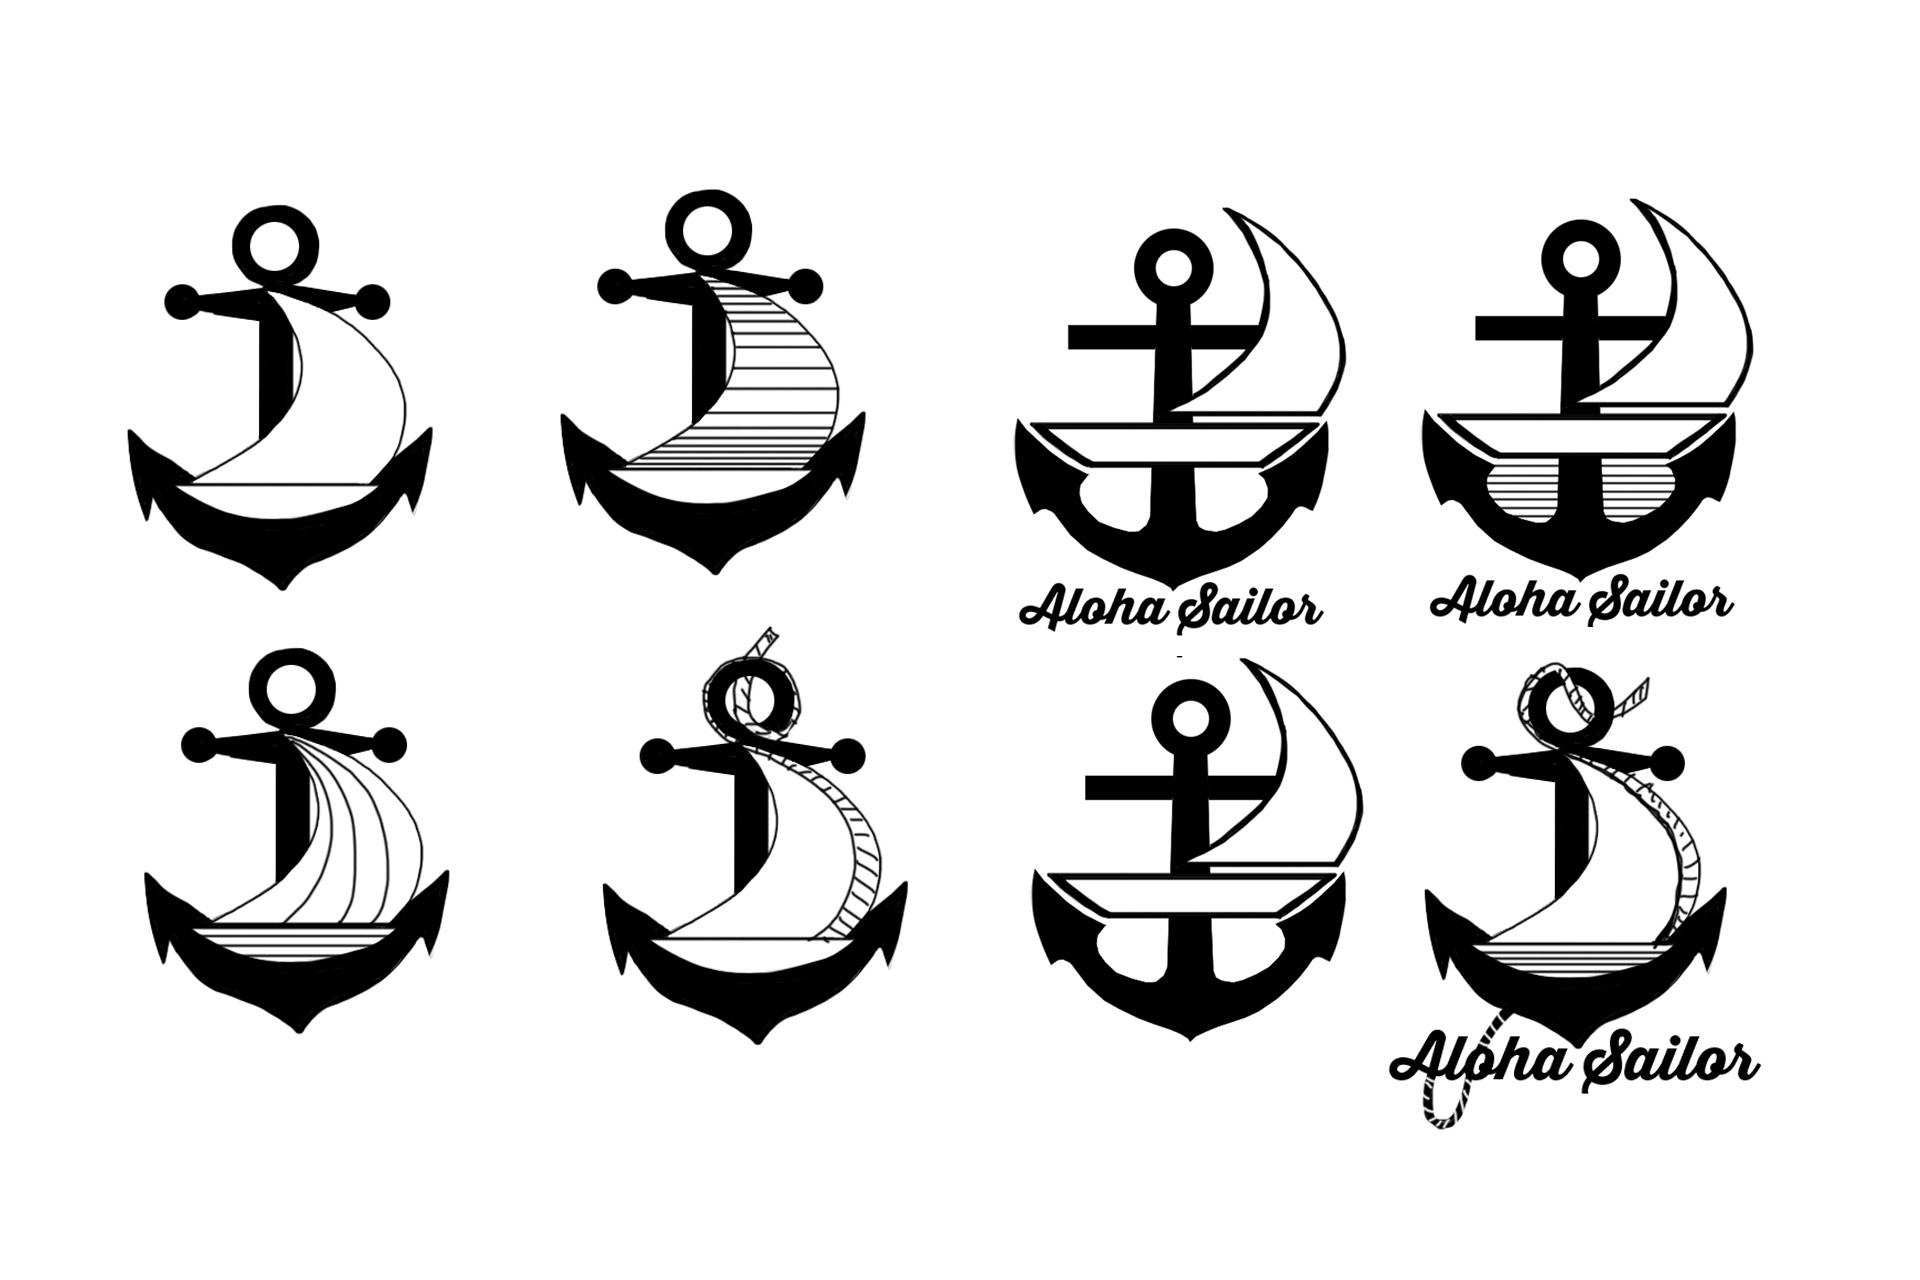 alohasailor2